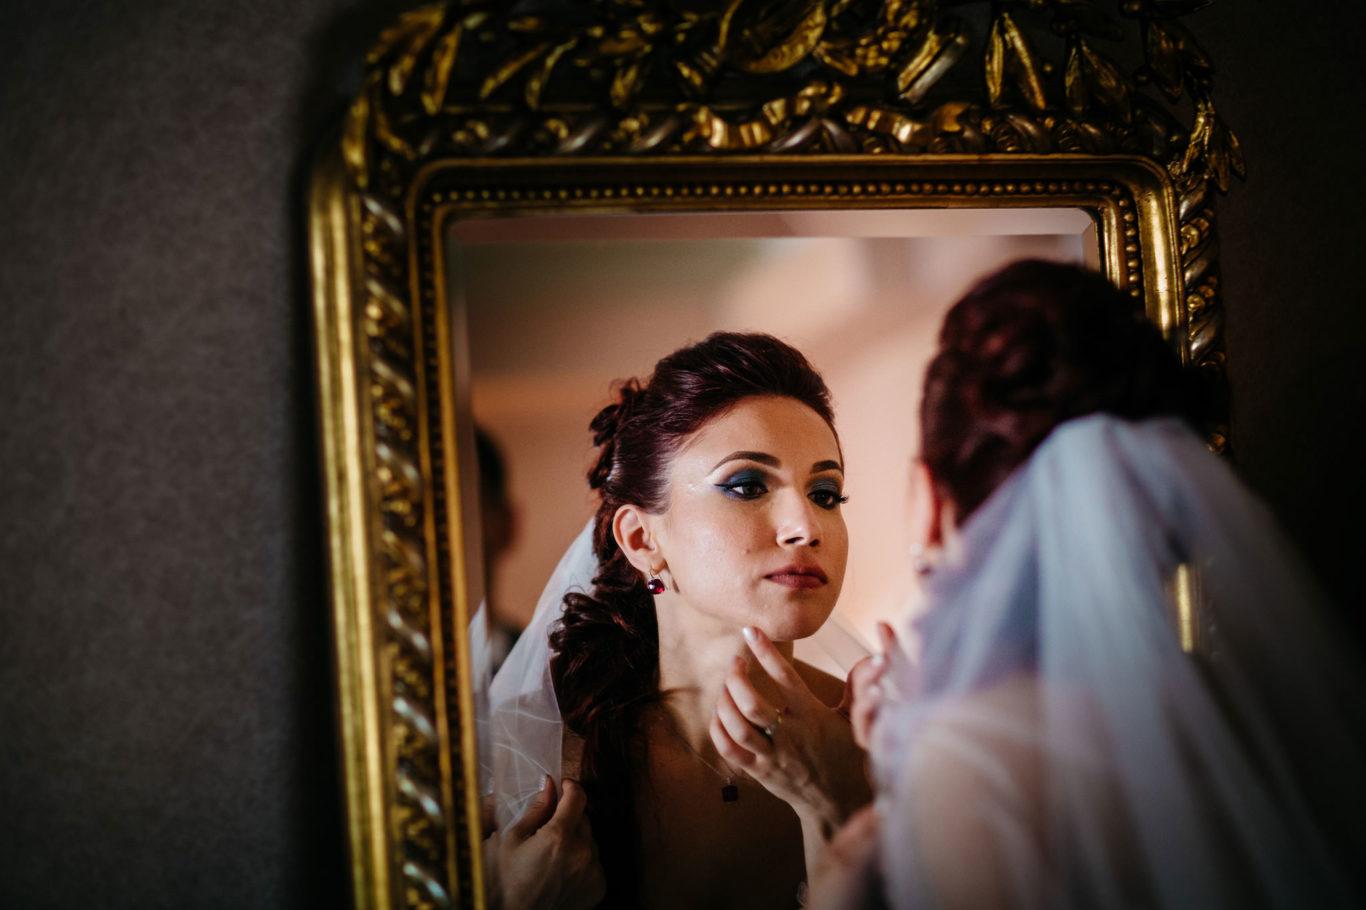 0248-fotografie-nunta-bucuresti-cristina-nicusor-fotograf-ciprian-dumitrescu-cd2_0057